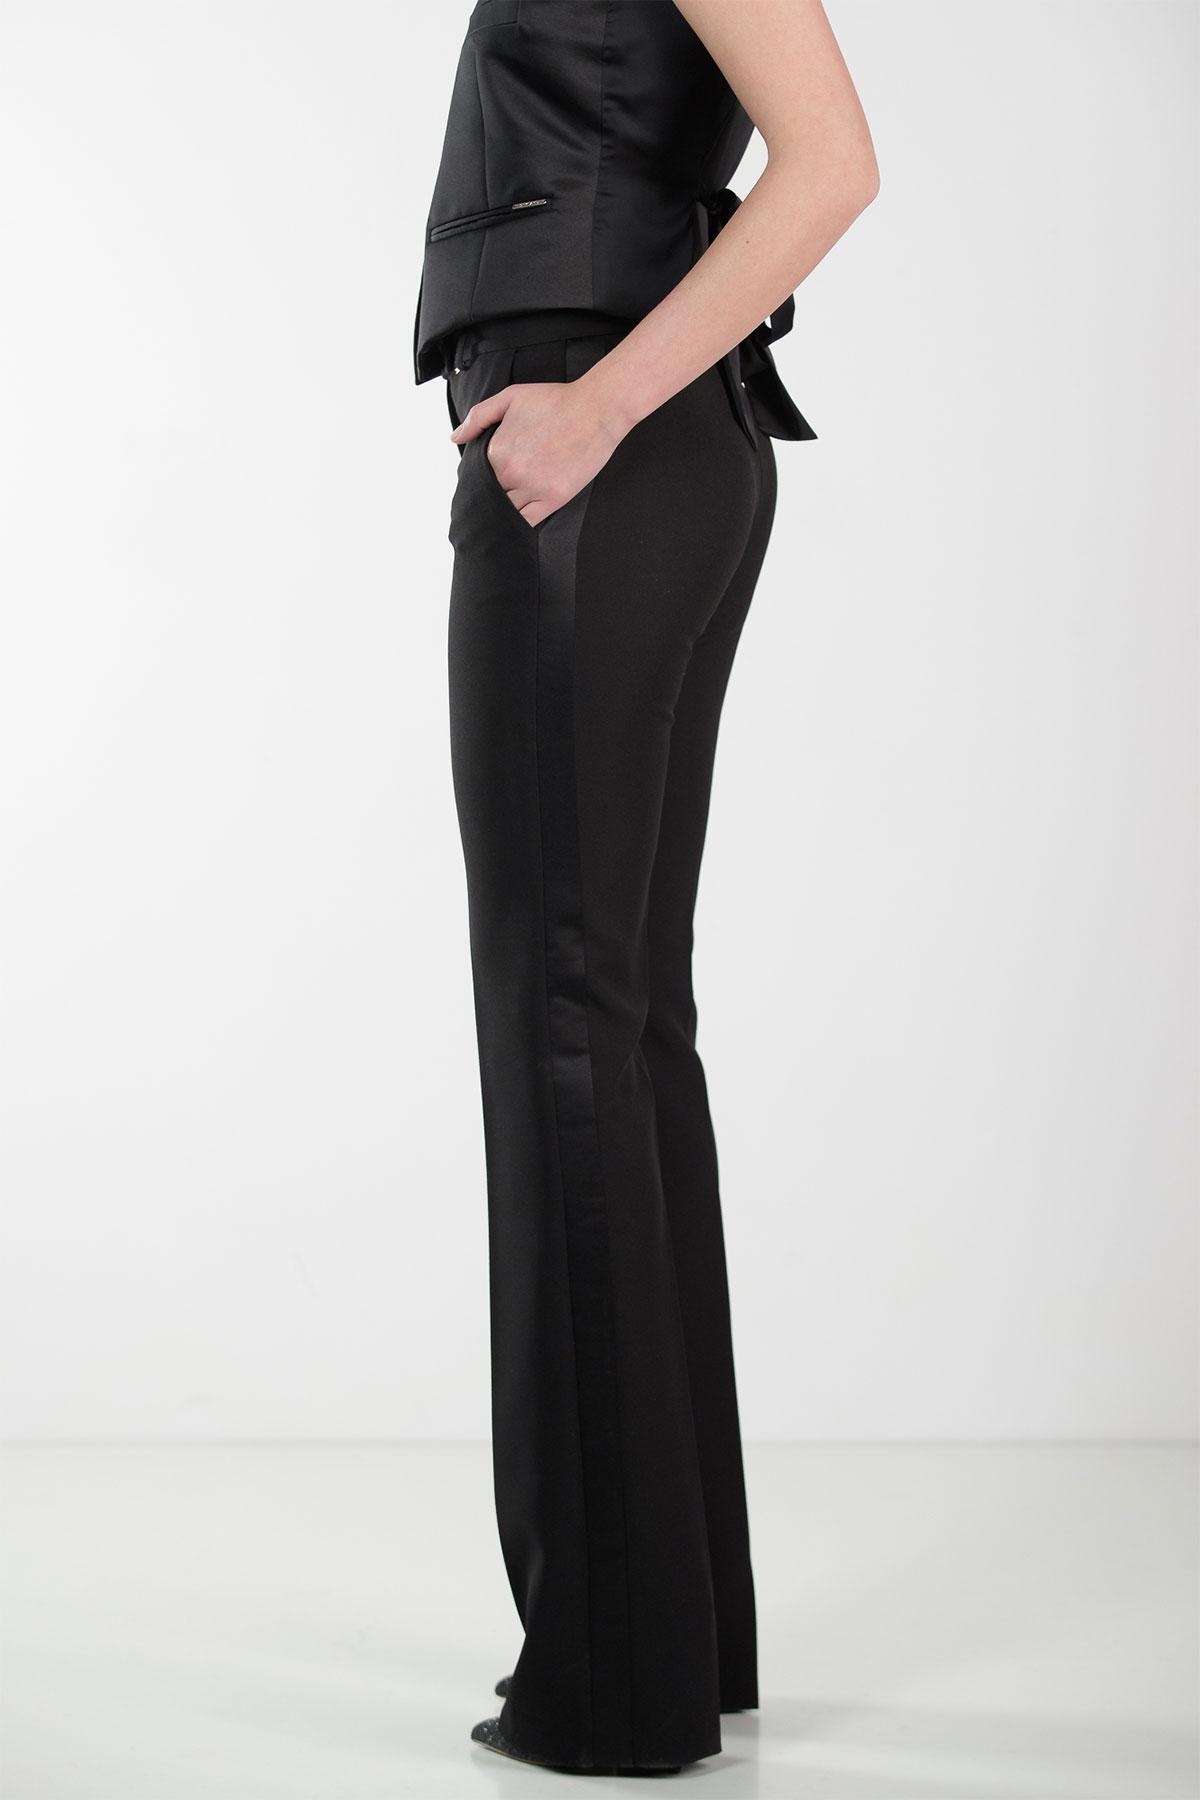 BLACK FLARED PANTS WITH BLACK STRIPE